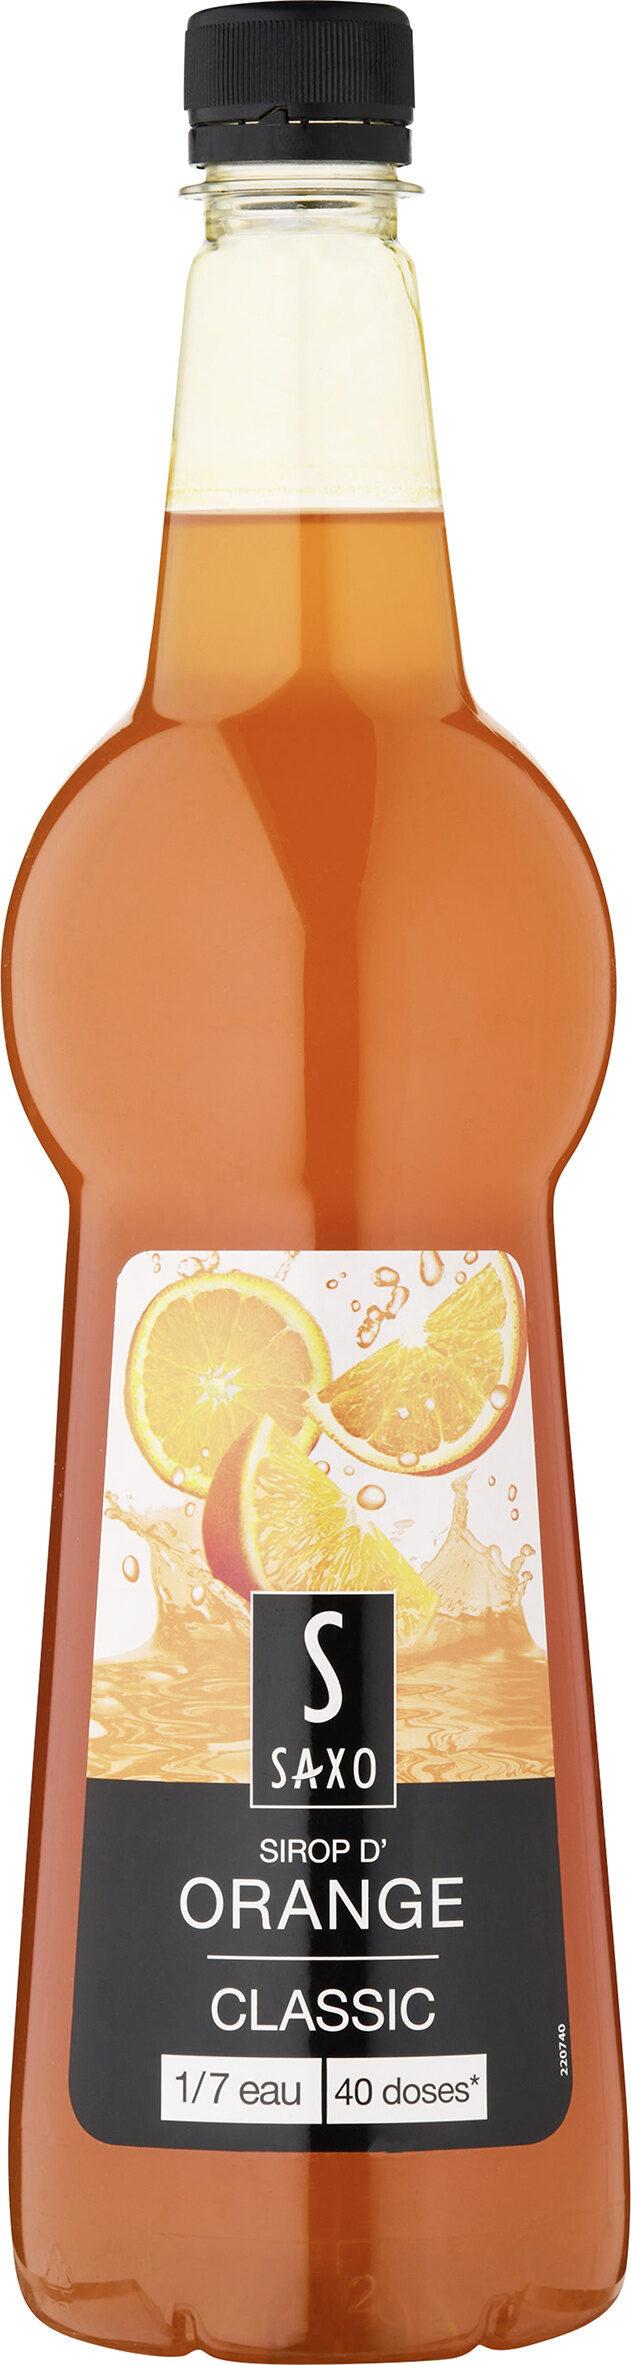 Sirop d'orange - Prodotto - fr